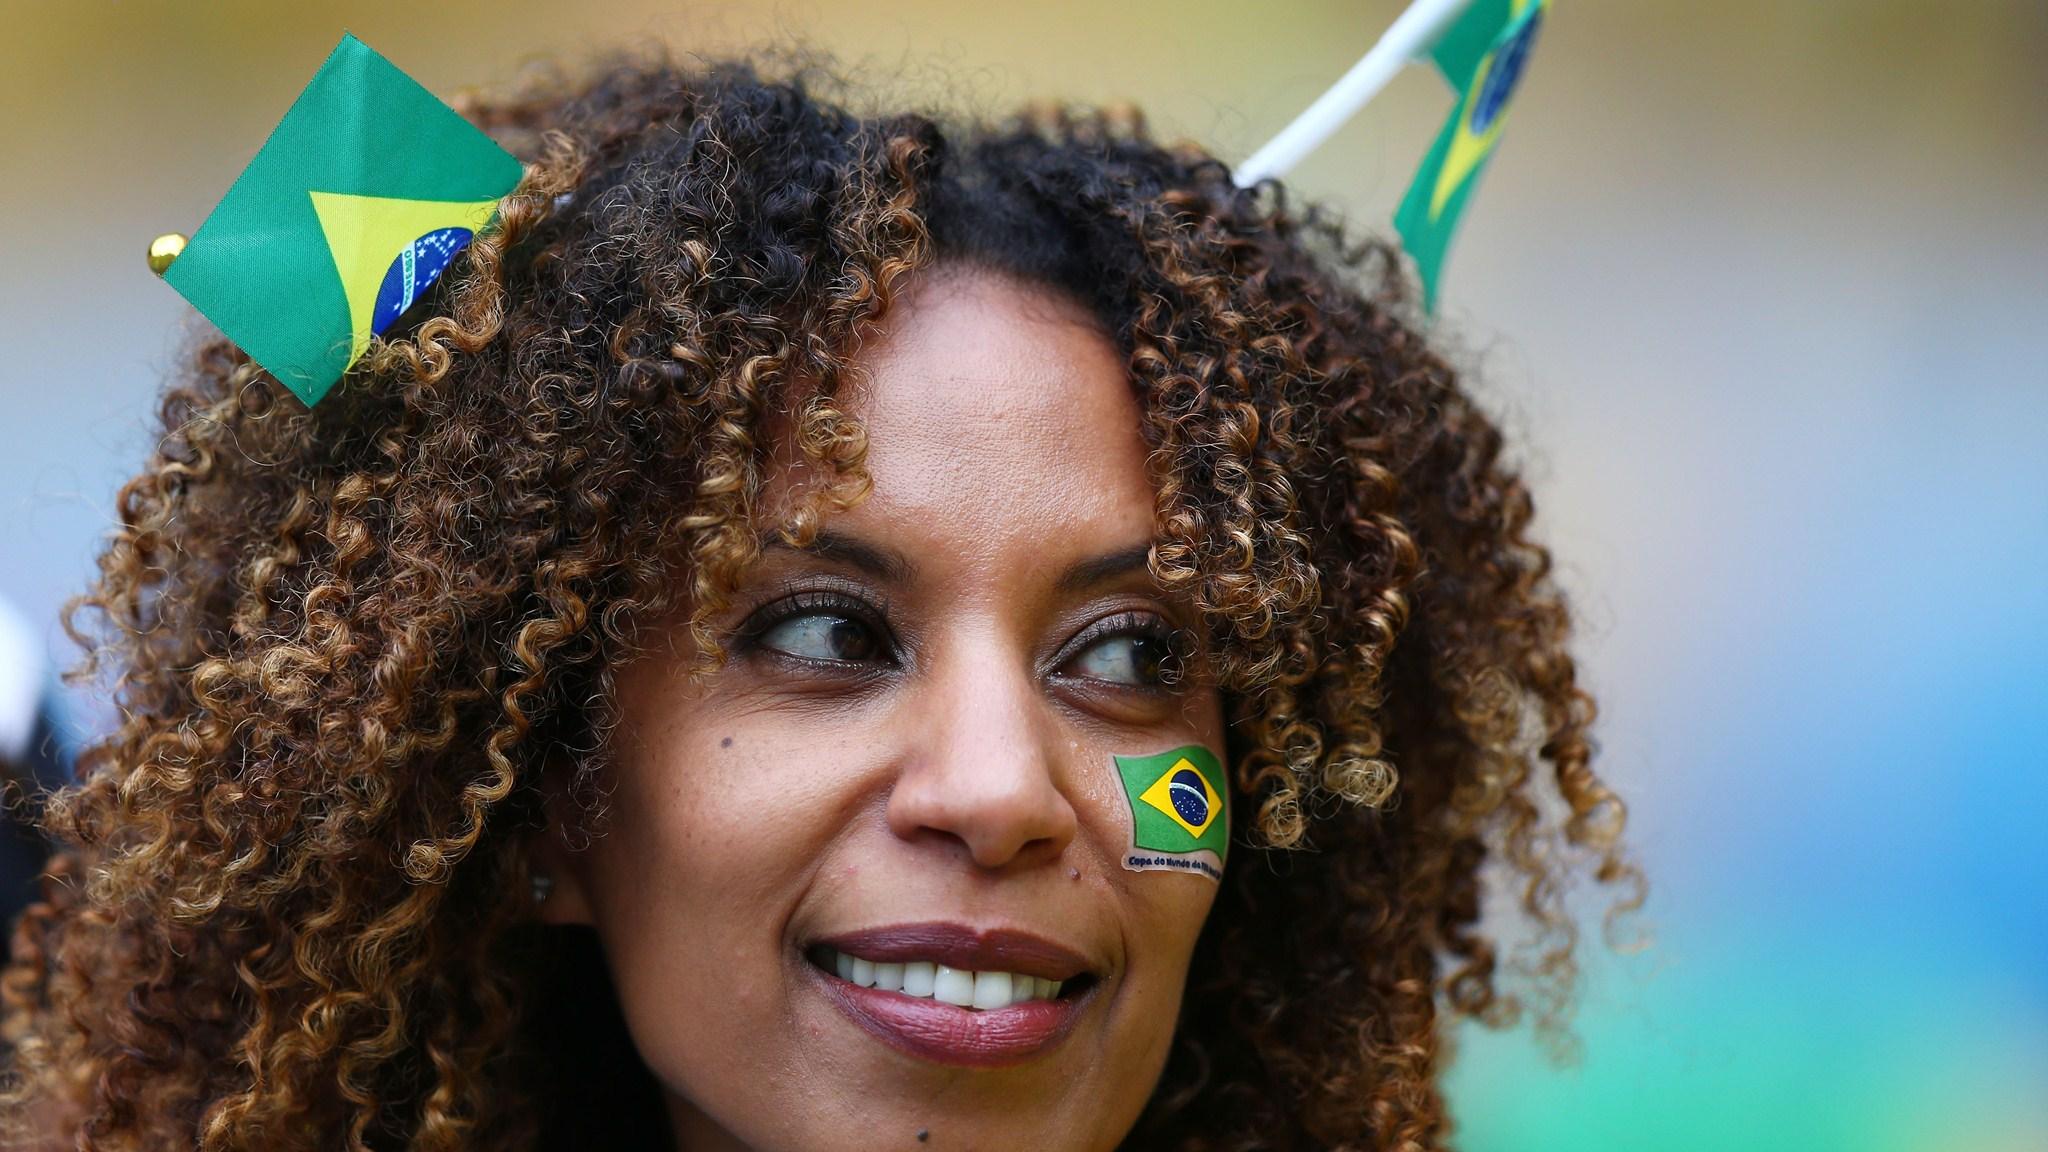 165 - Brazil-Germany [1-7] -- 08 Jul 2014 - 17-00 - kuaza